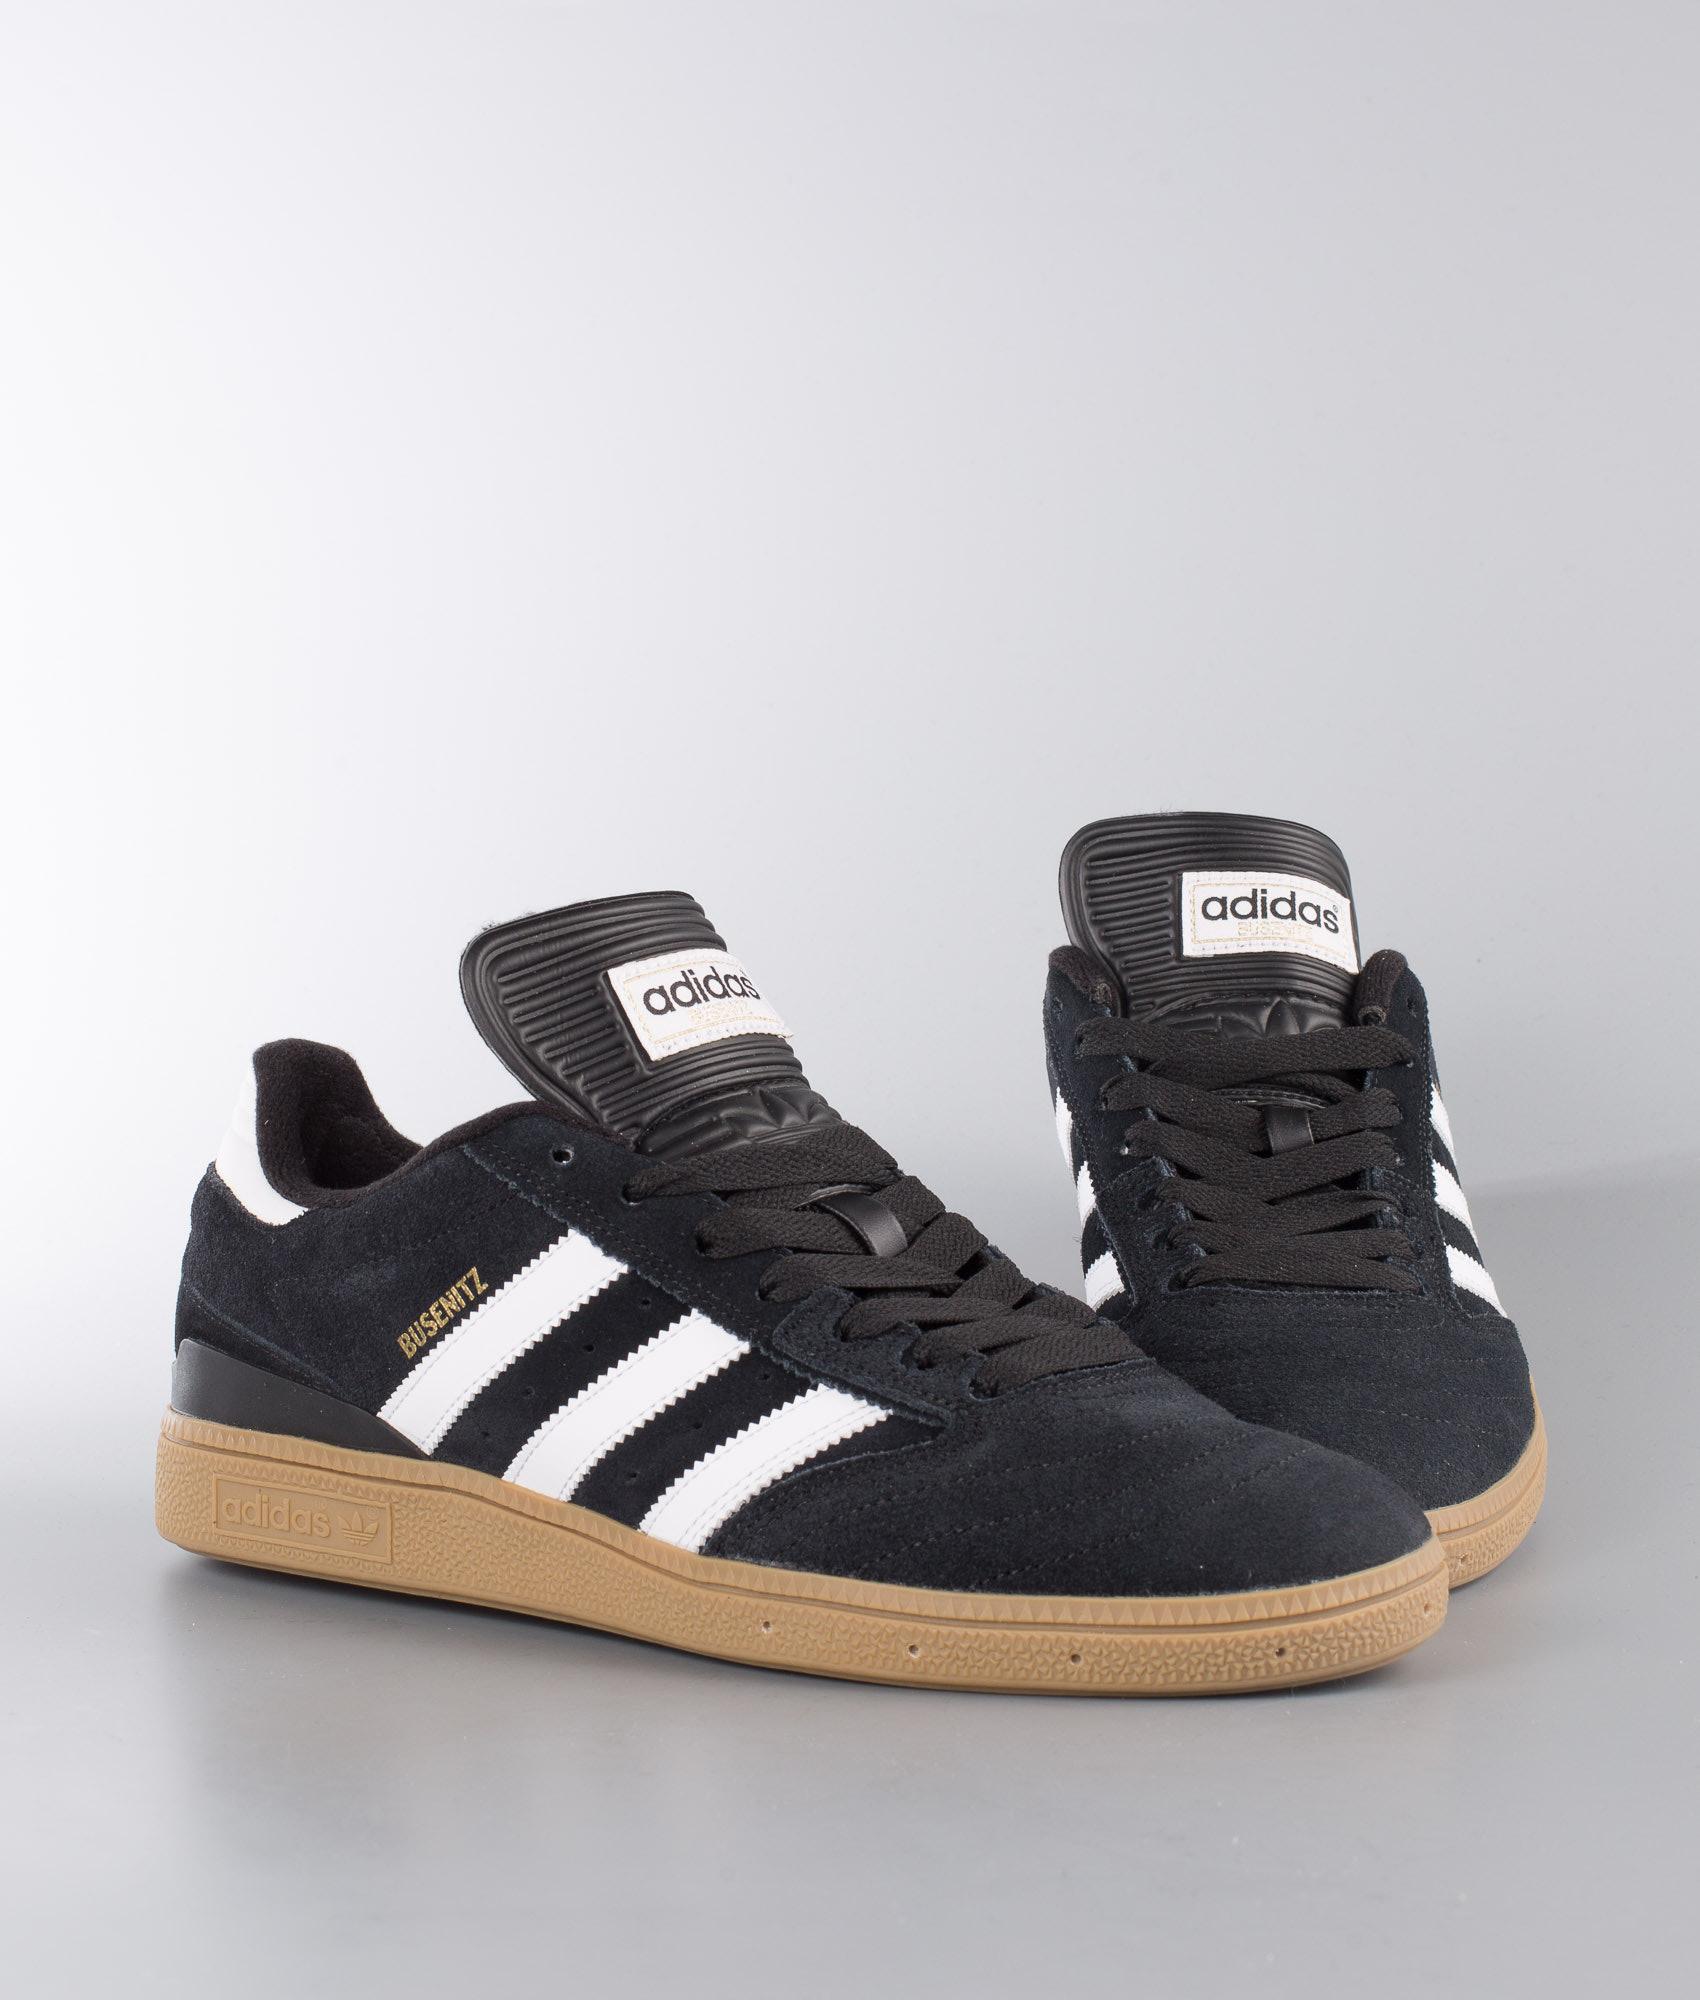 821b697868e Adidas Skateboarding Busenitz Shoes Black1 Running White Metallic ...